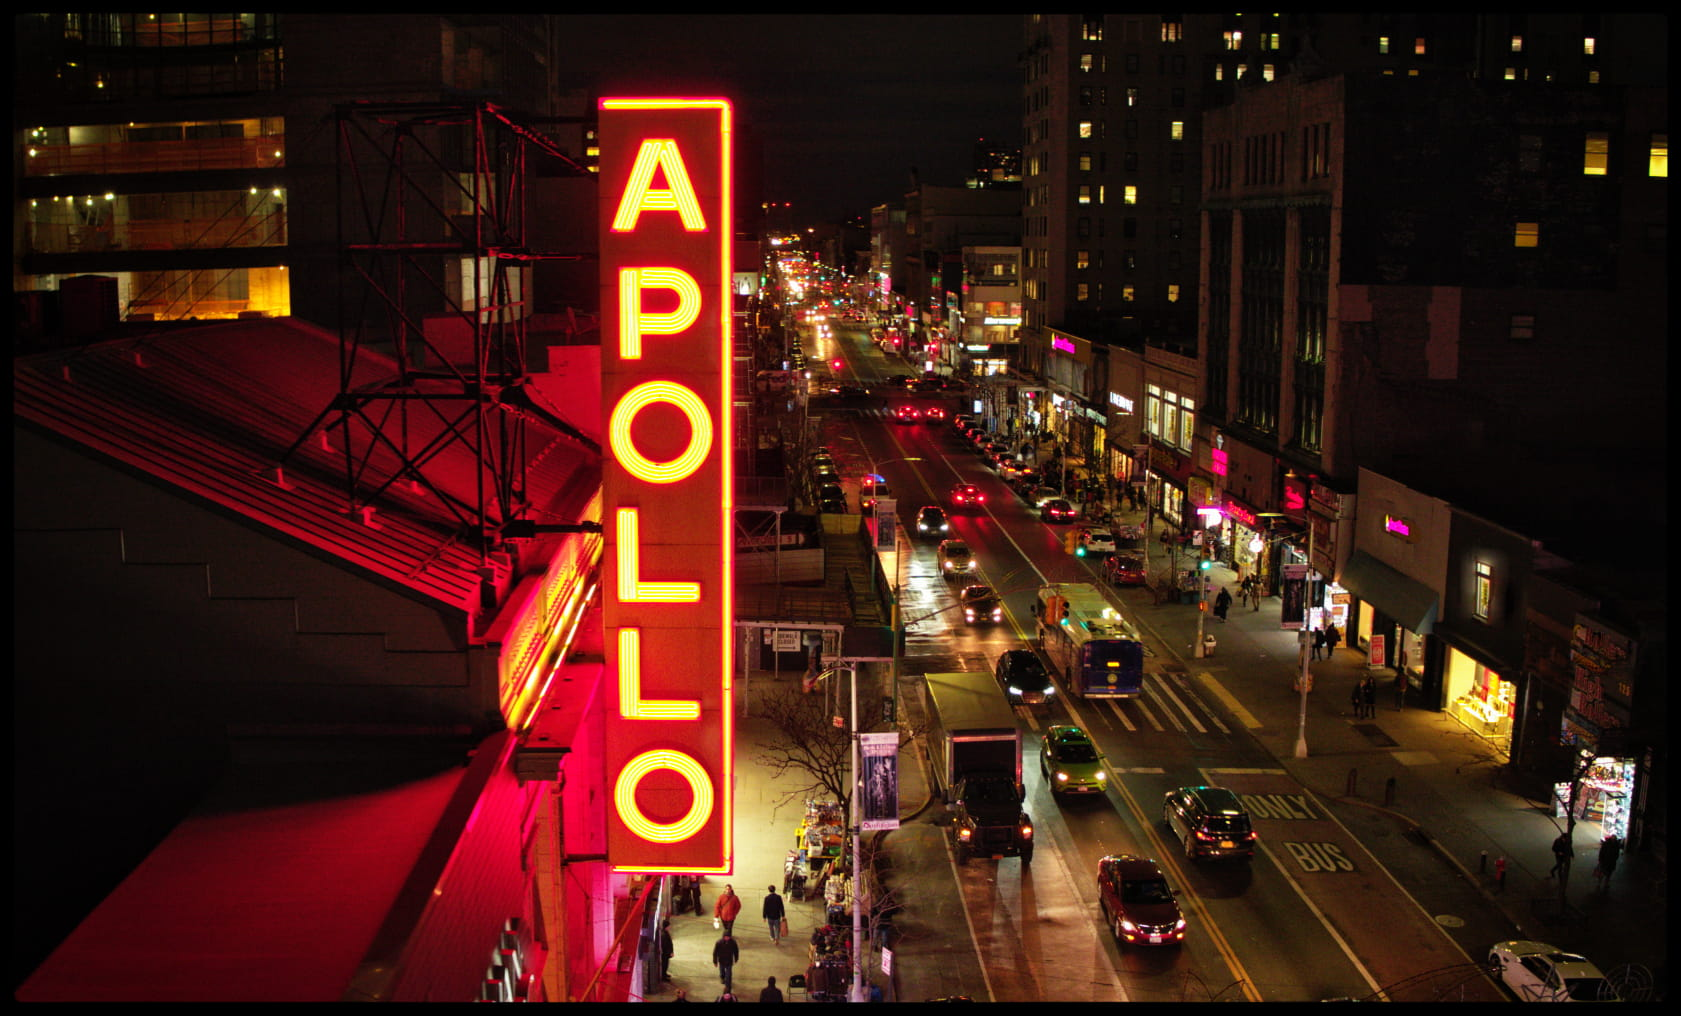 apollo_001_highres - Reggie Chelsom (1)-1.jpg